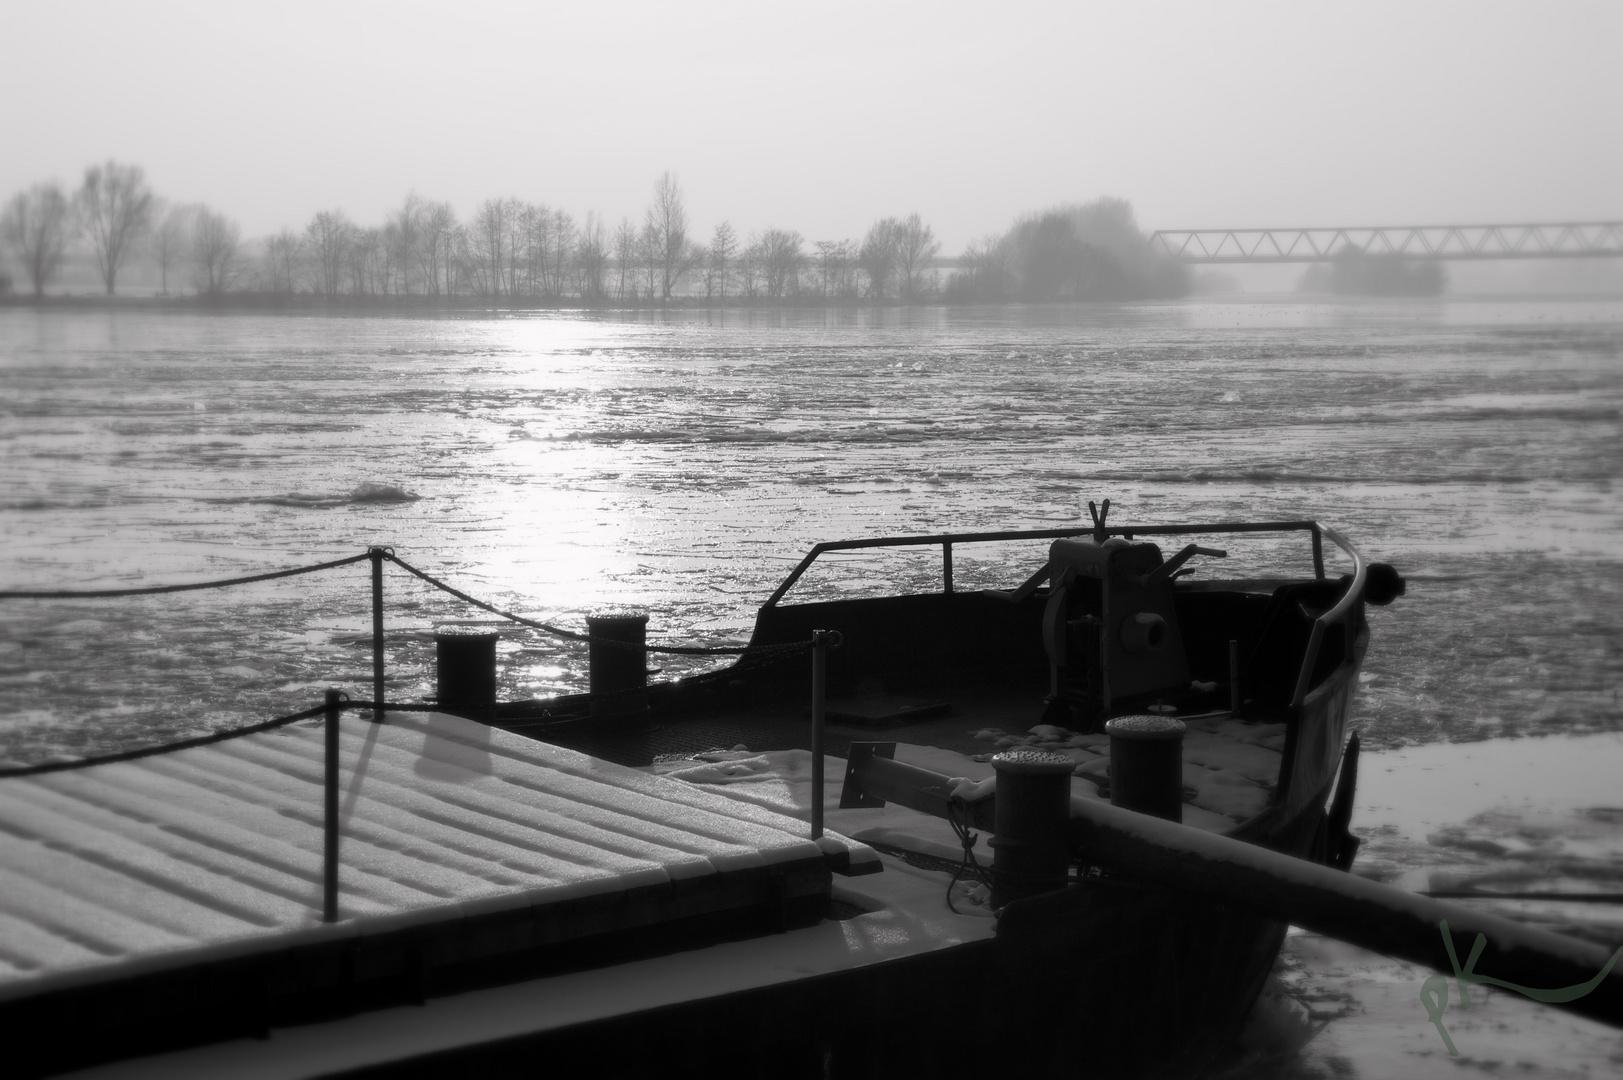 Schiff auf gefrorener Donau